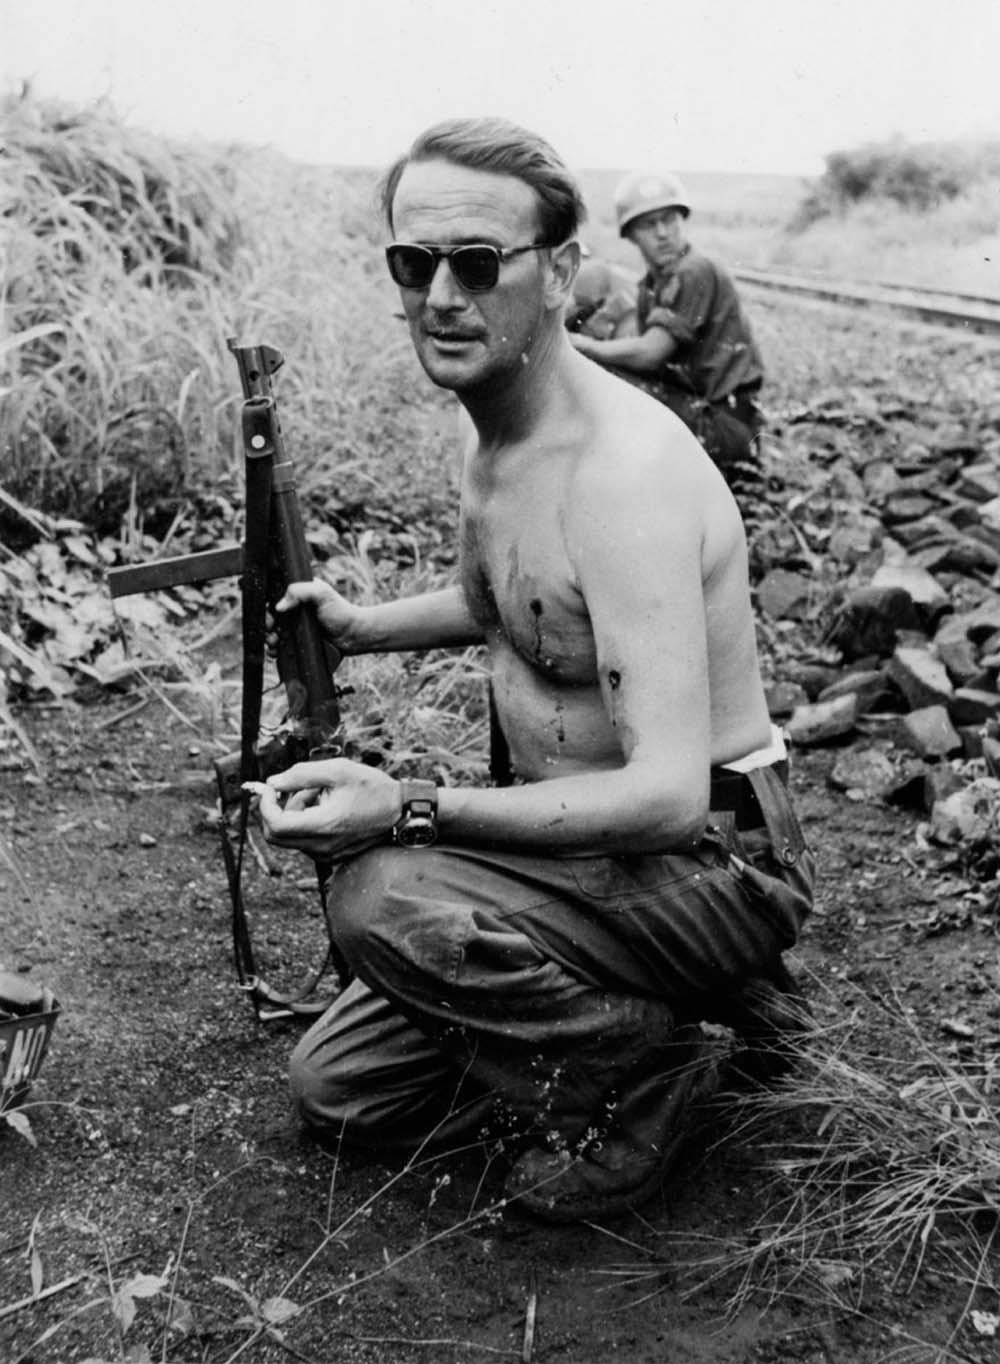 Swedish Major Erik Bonde smokes a cigarette after being ambushed and shot twice. Congo, Jan 15th 1961.